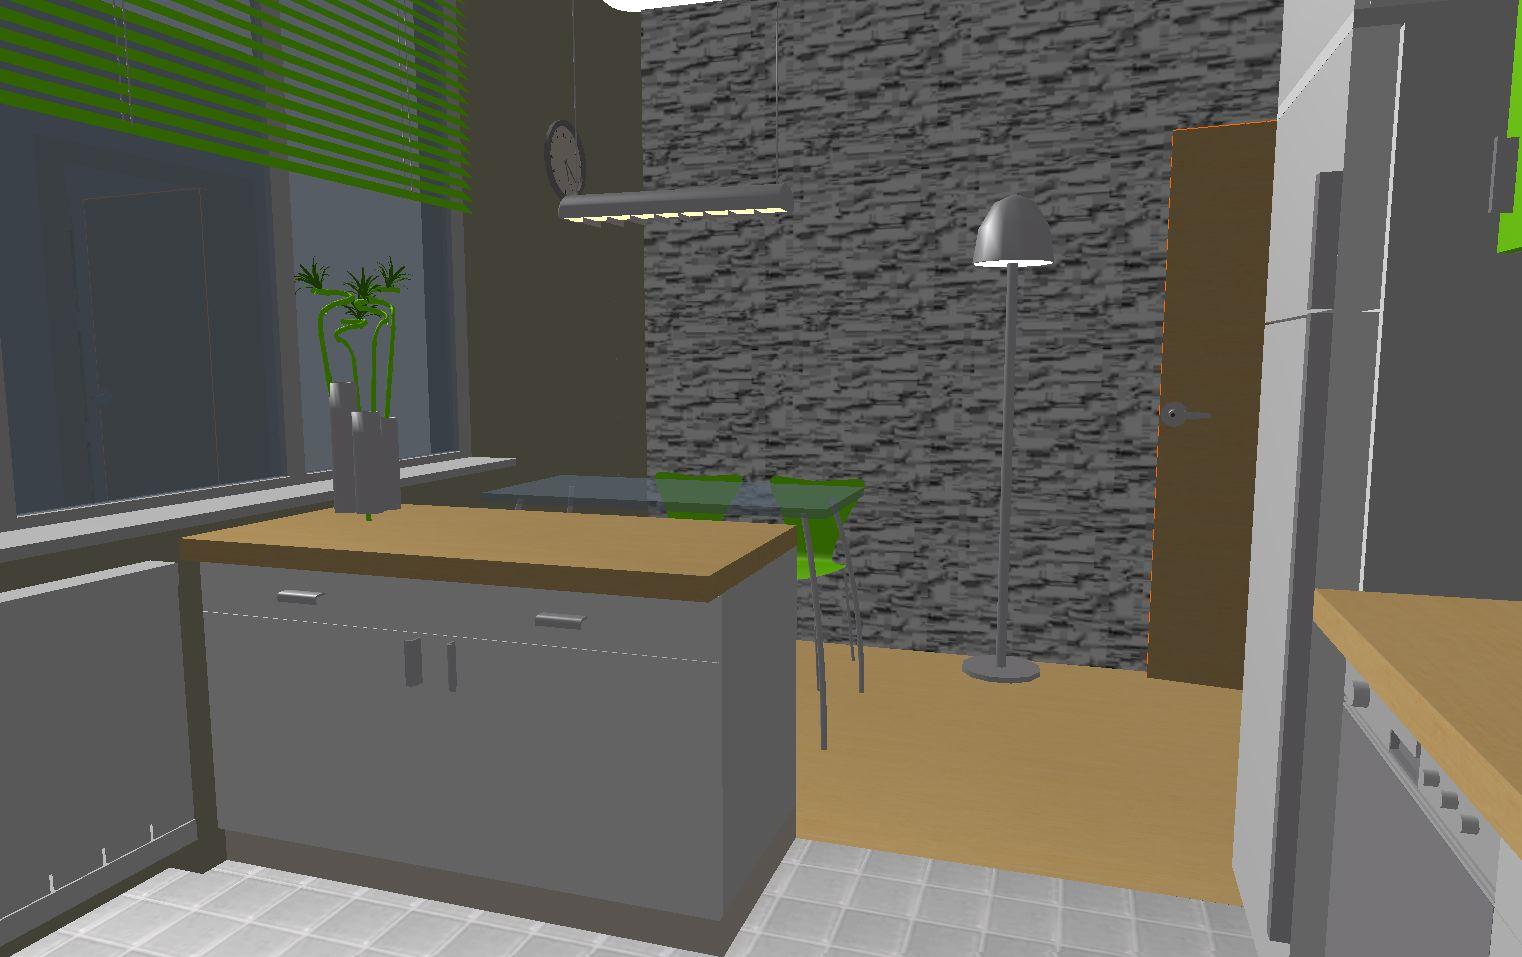 Architekt Pabianice OOO studio Architektura i Design portfolio projekt wnętrza kuchnia 4